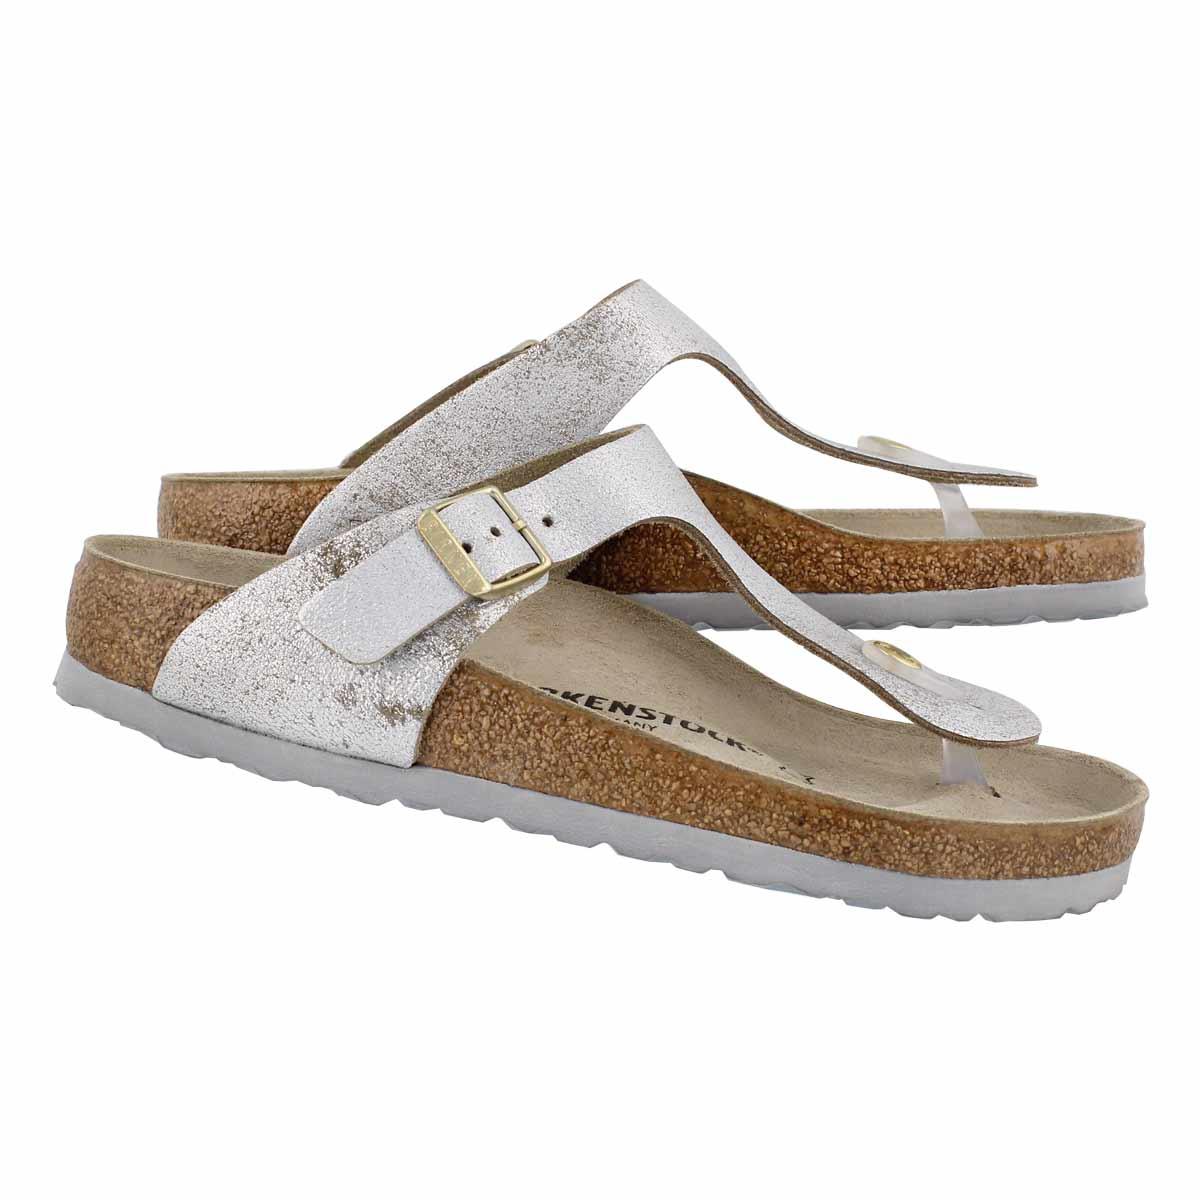 Lds Gizeh LTR wshd mtlc blu slvr sandal